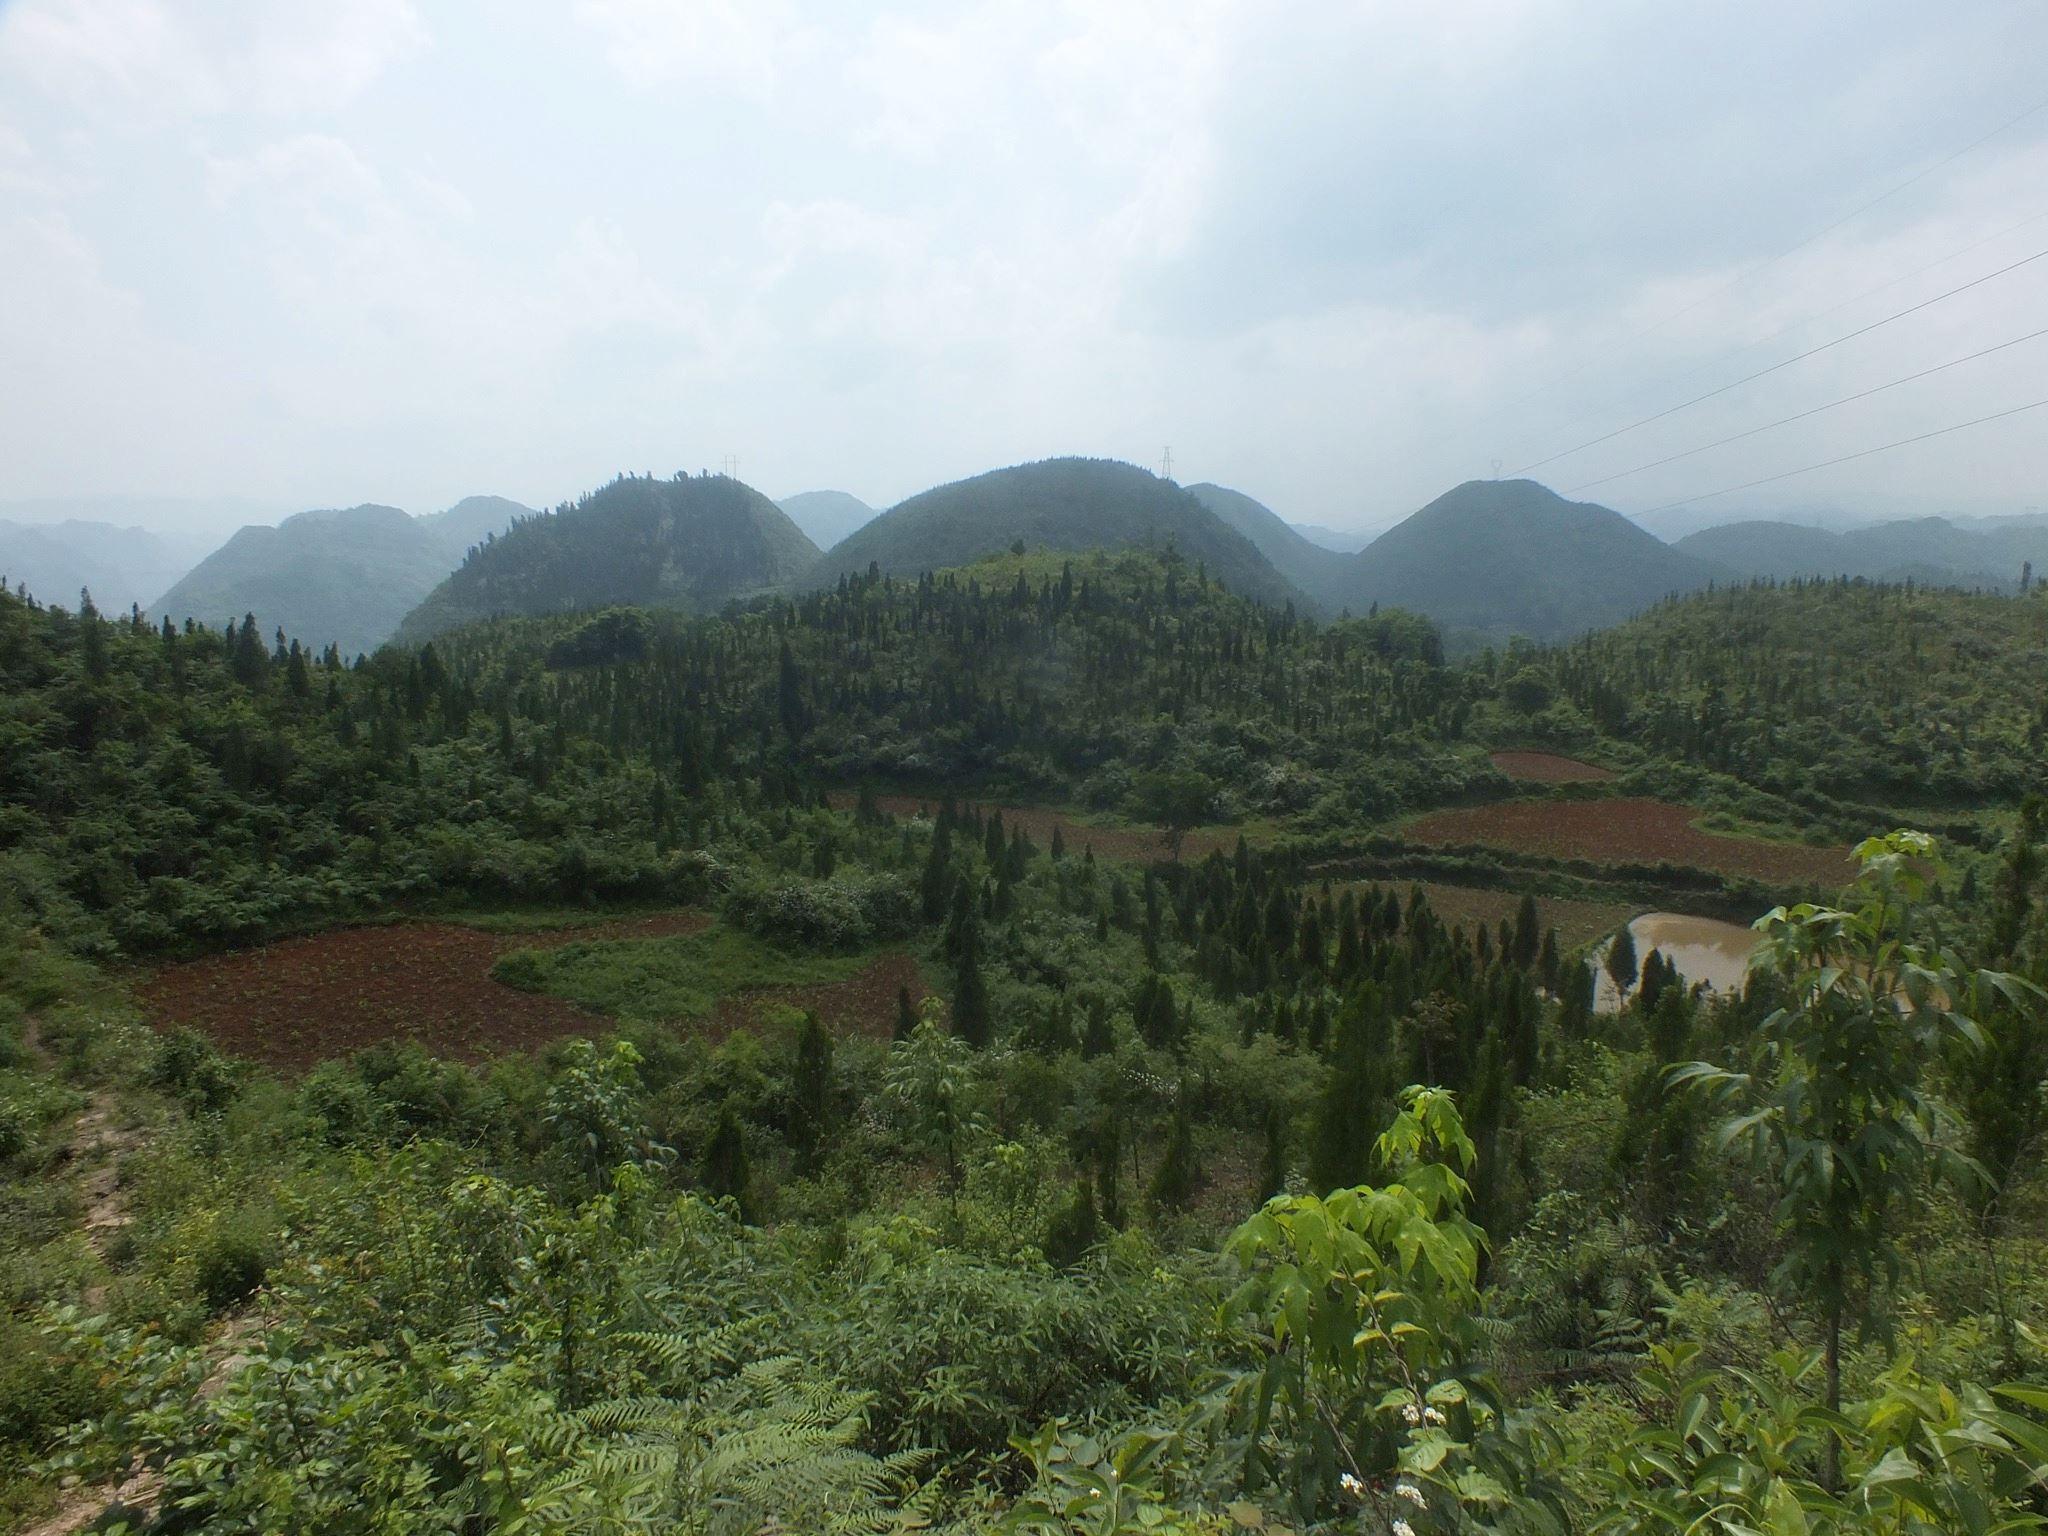 Guizhou's hills, June 2014. (Photo by me)